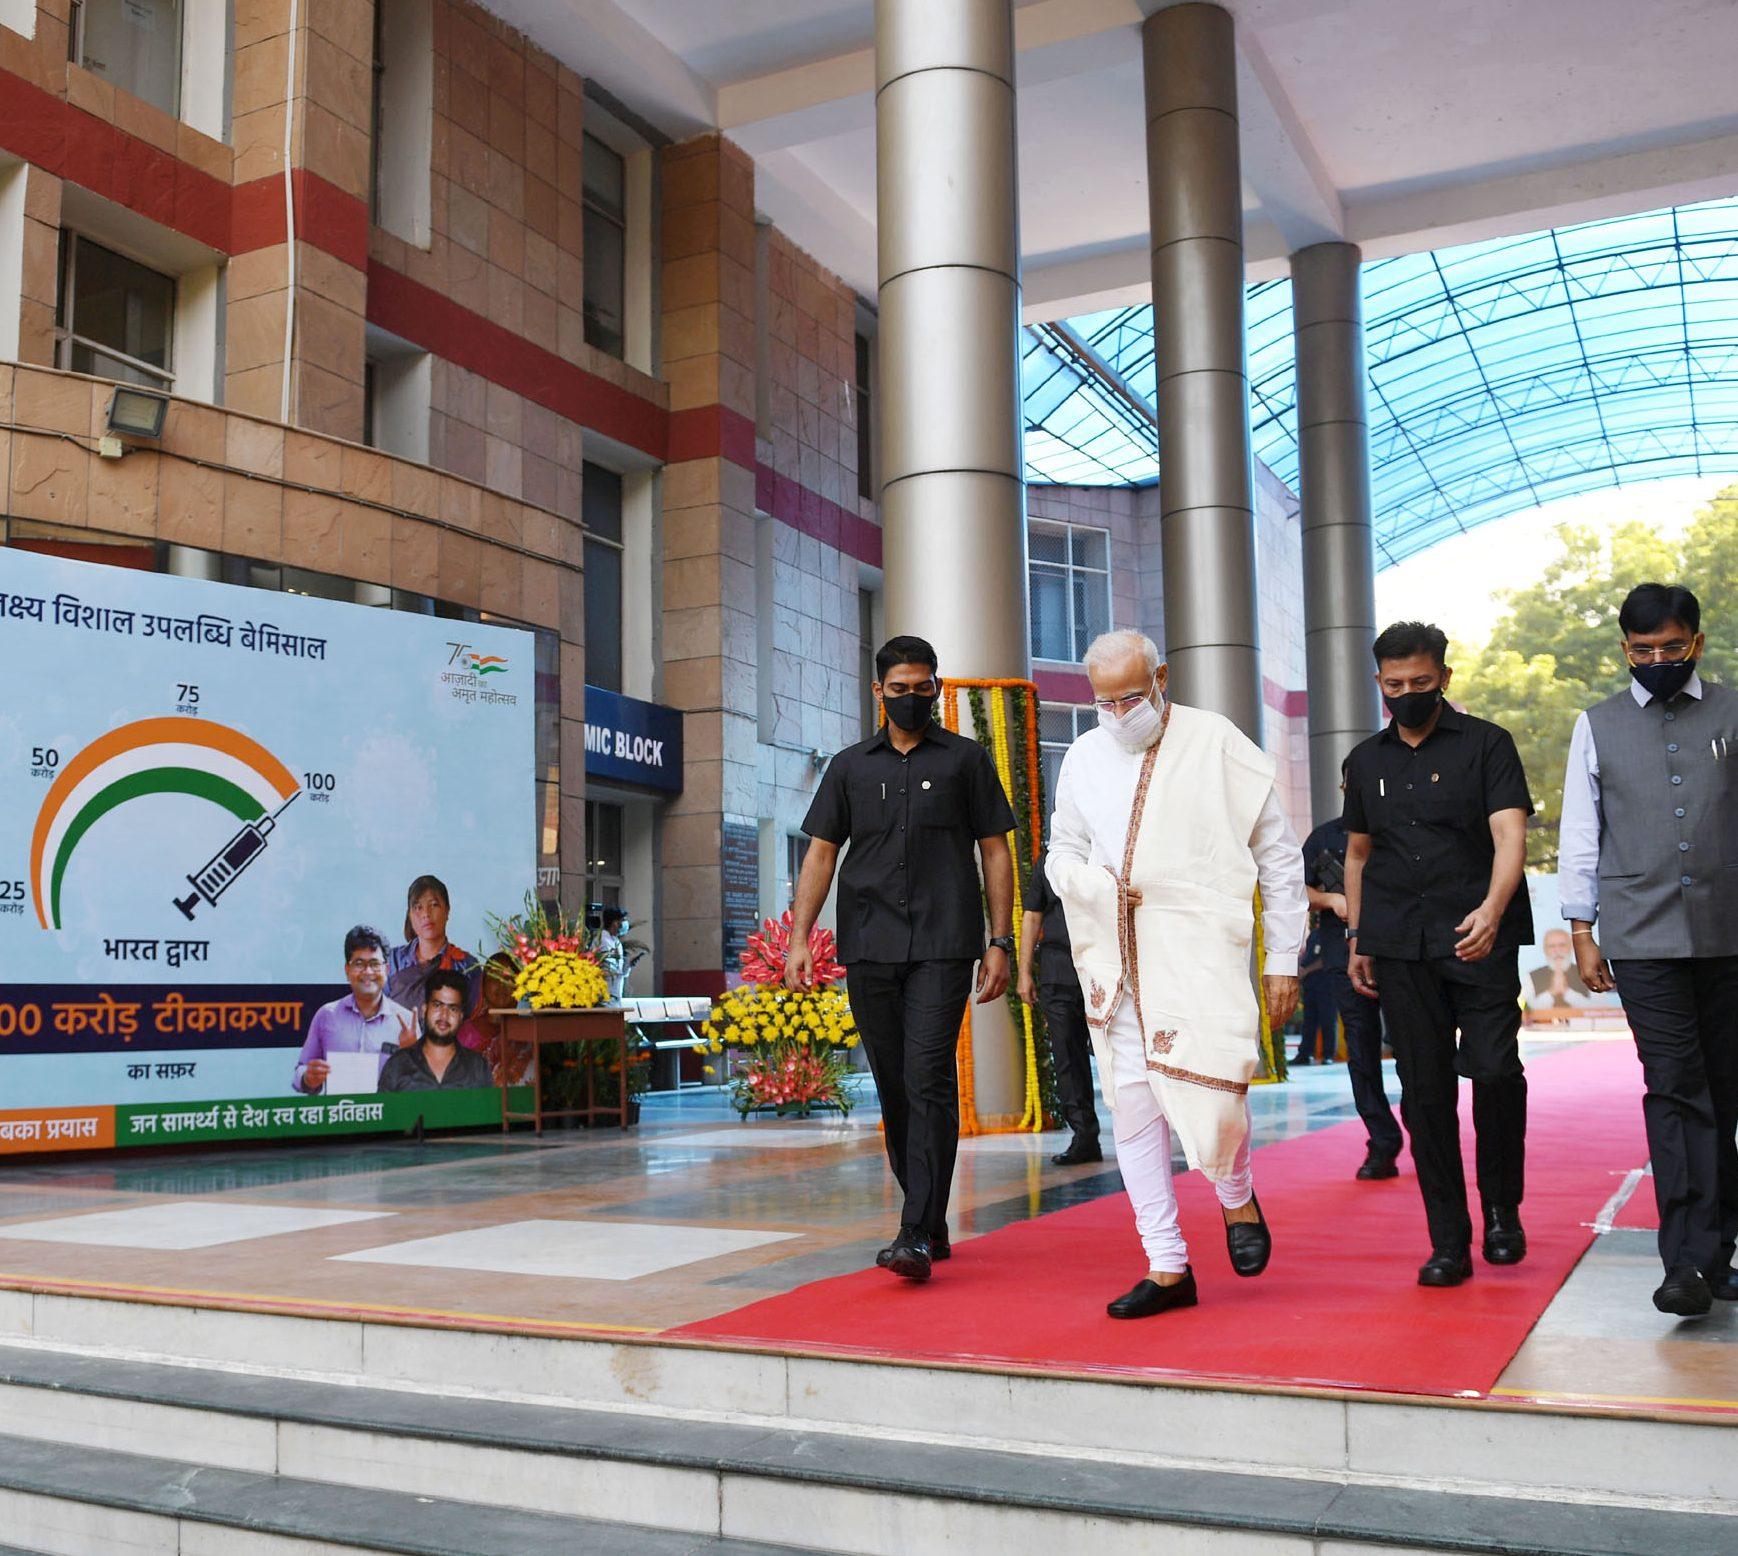 The Prime Minister, Shri Narendra Modi visits the vaccination centre at Dr. Ram Manohar Lohia Hospital, in New Delhi on October 21, 2021.